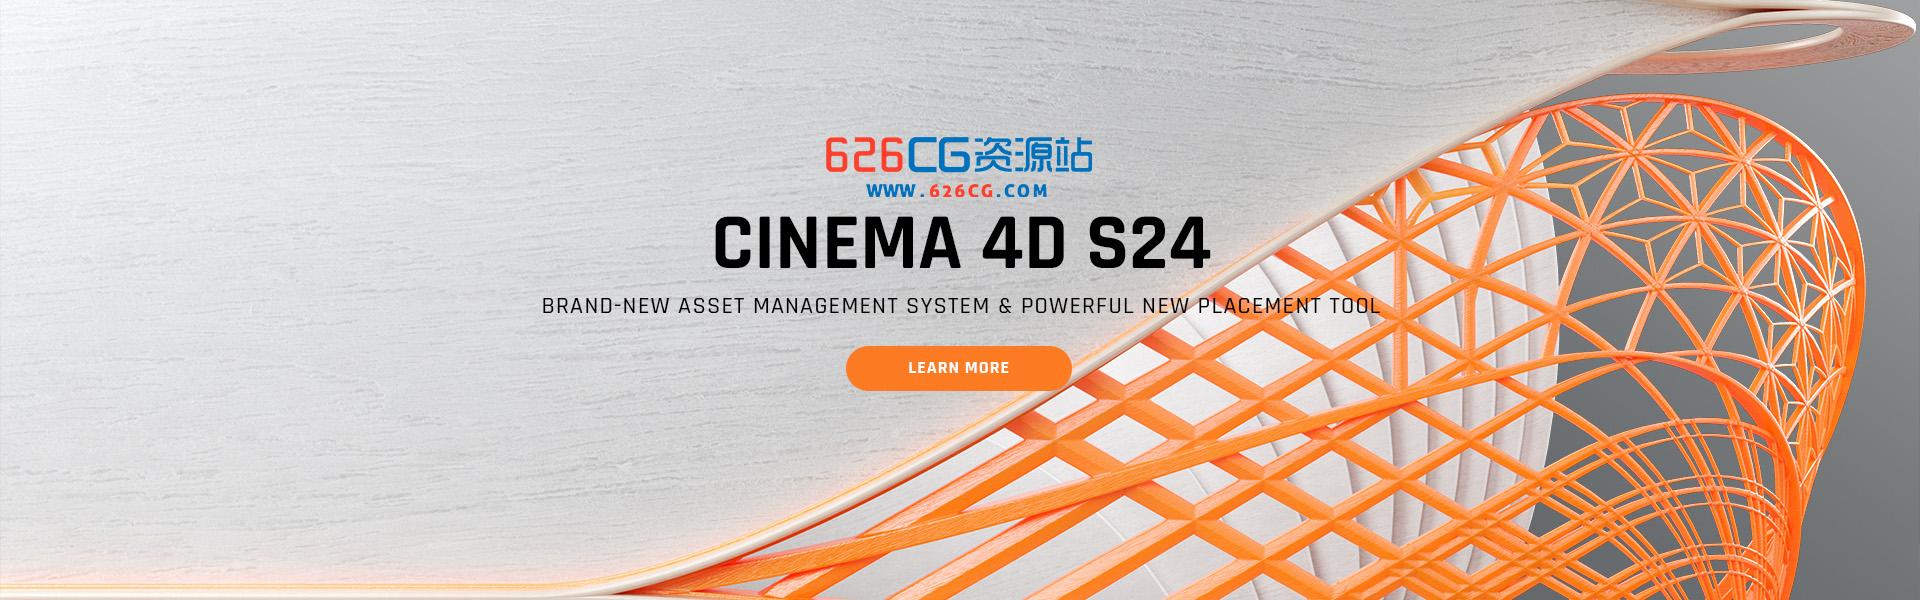 C4D S24三维软件Maxon CINEMA 4D Studio S24.035 Multi Win中文版/英文版 626CG资源站